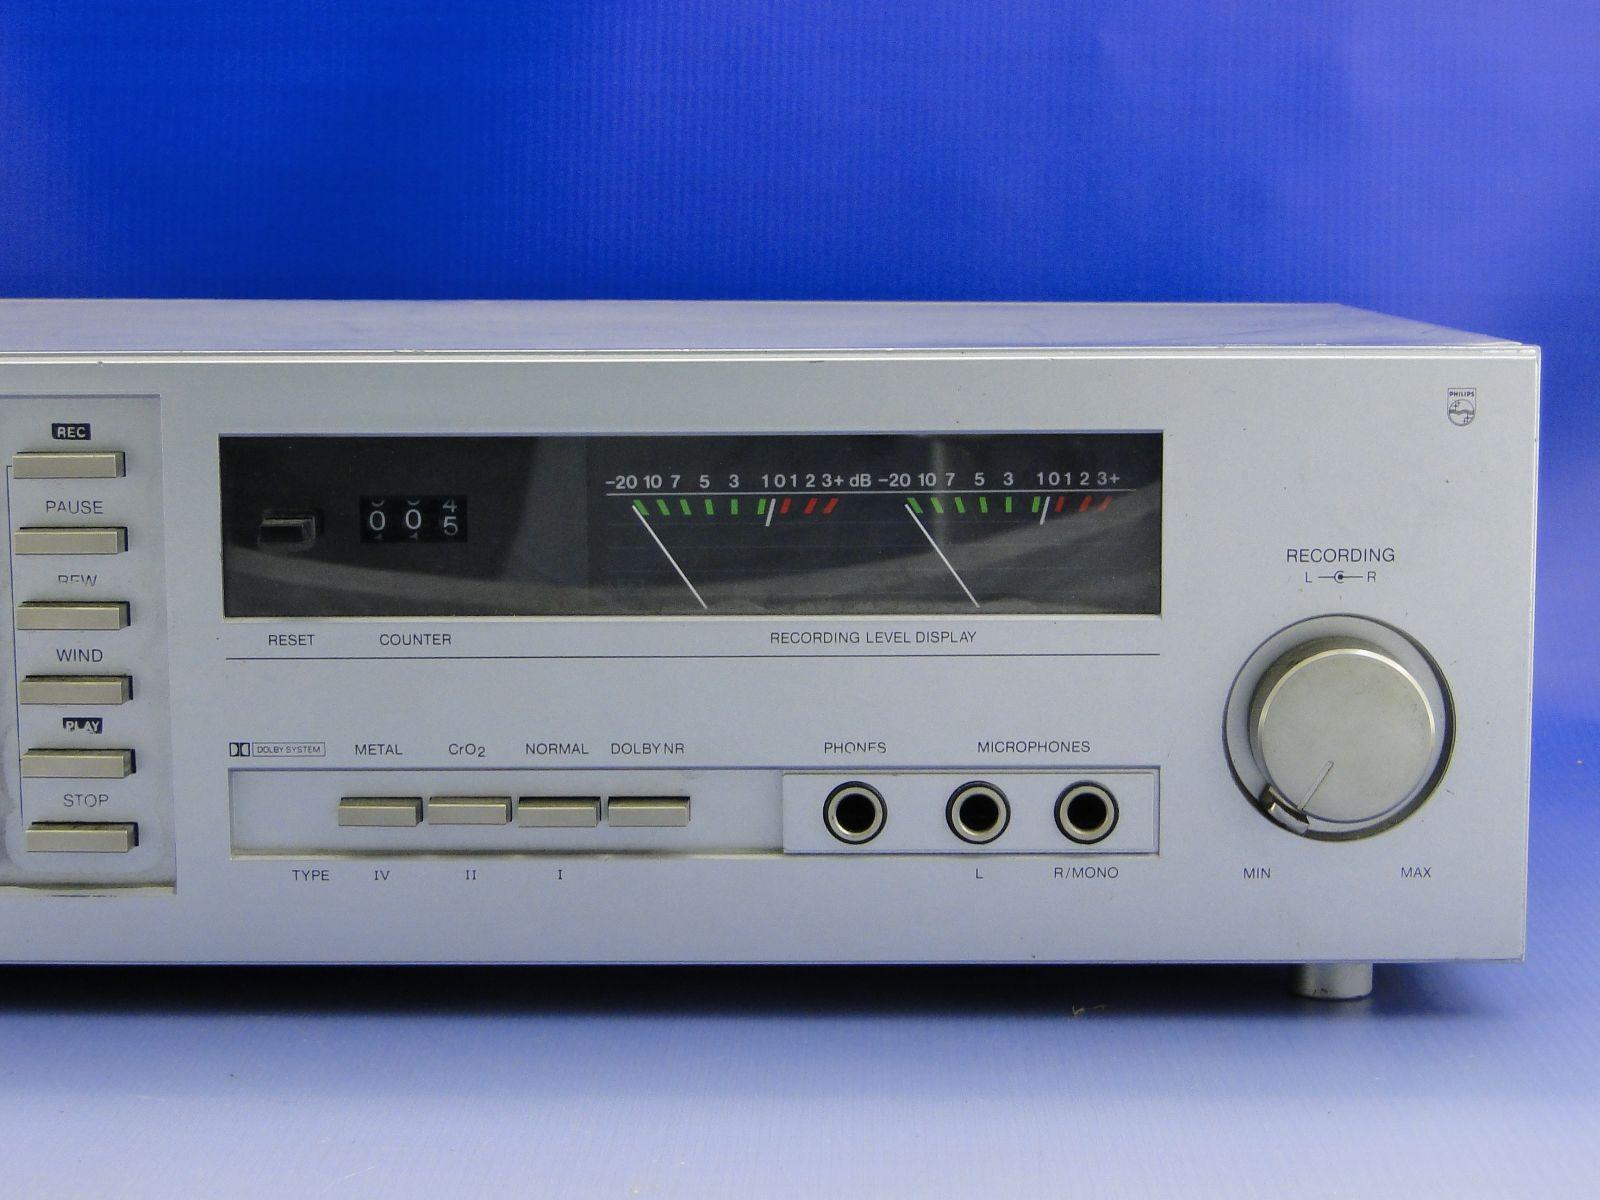 DSC00641.JPG (1600×1200)